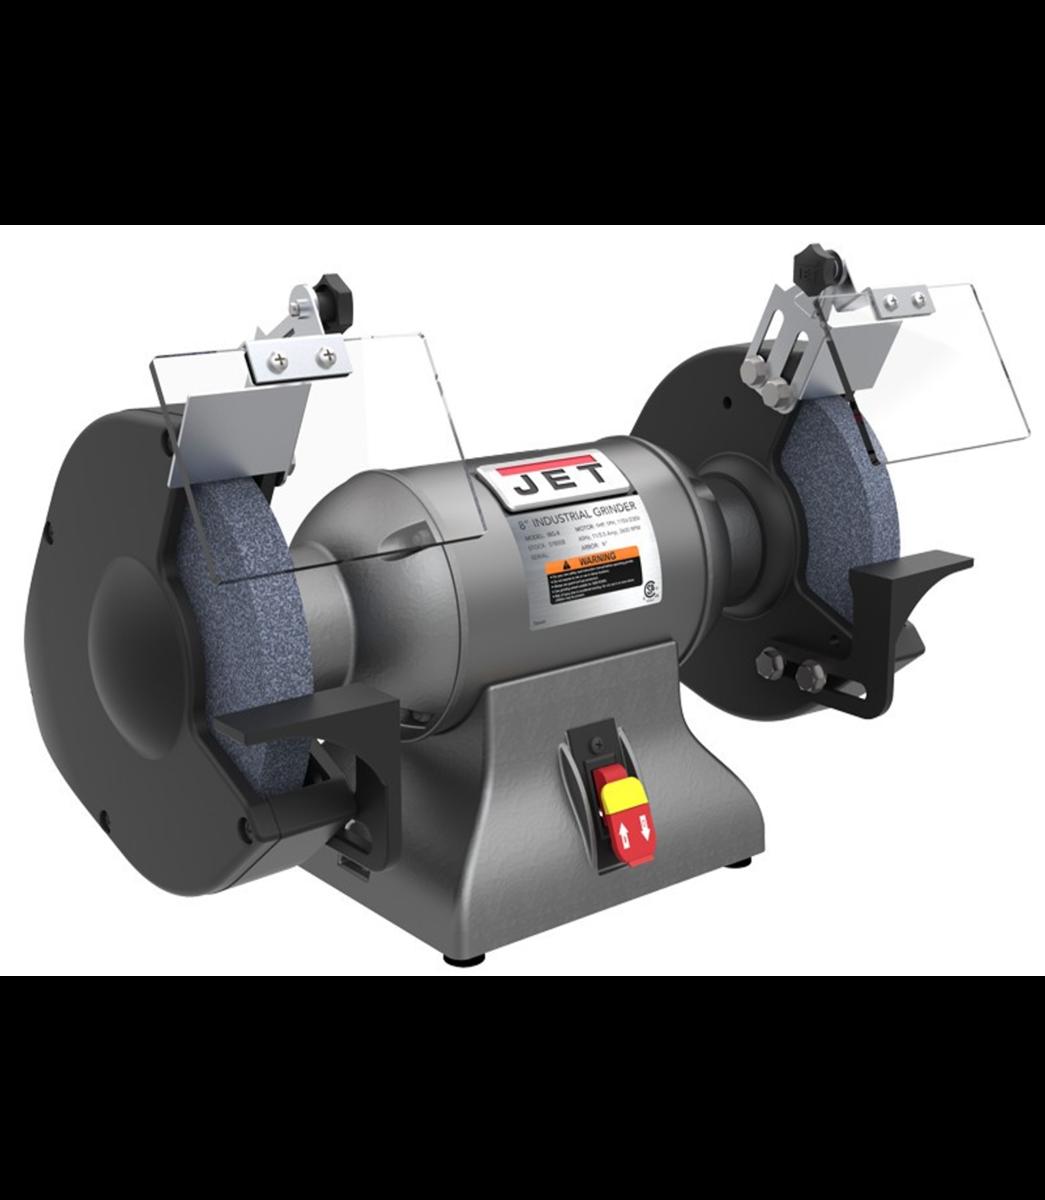 "IBG-10, 10"" Industrial Bench Grinder"